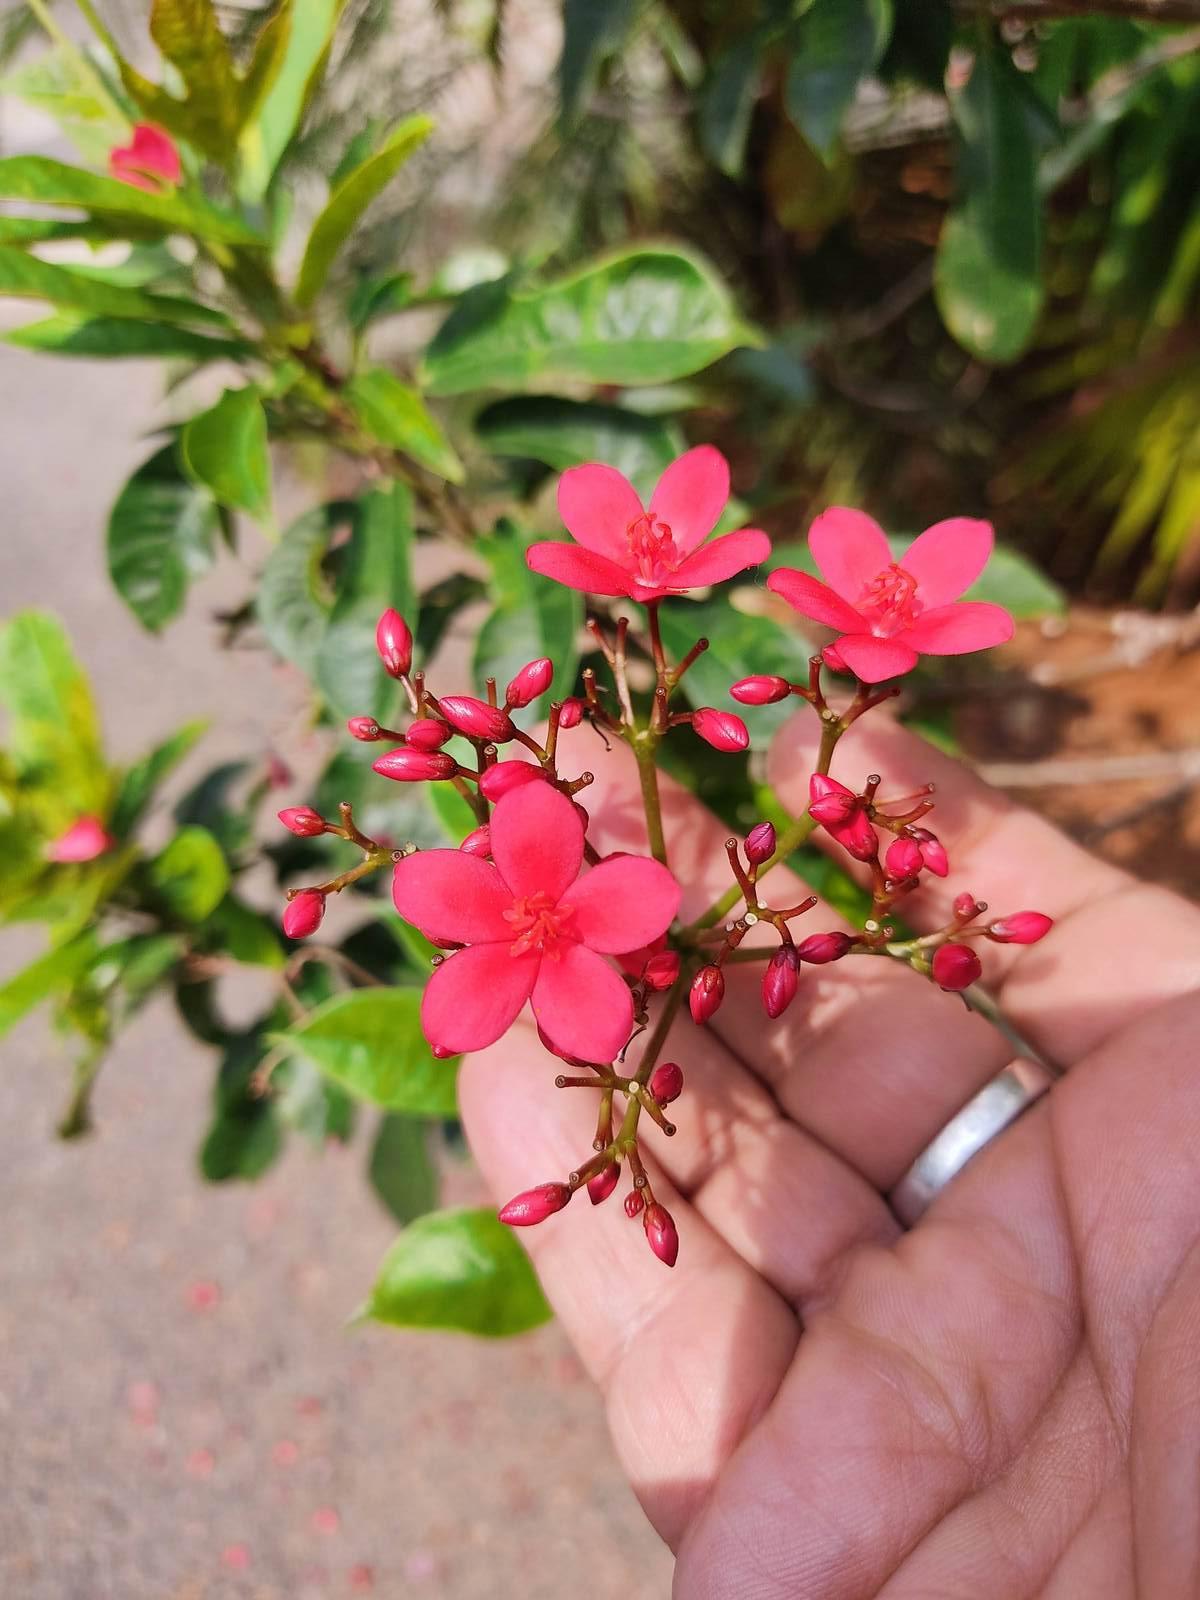 Dominating Plant